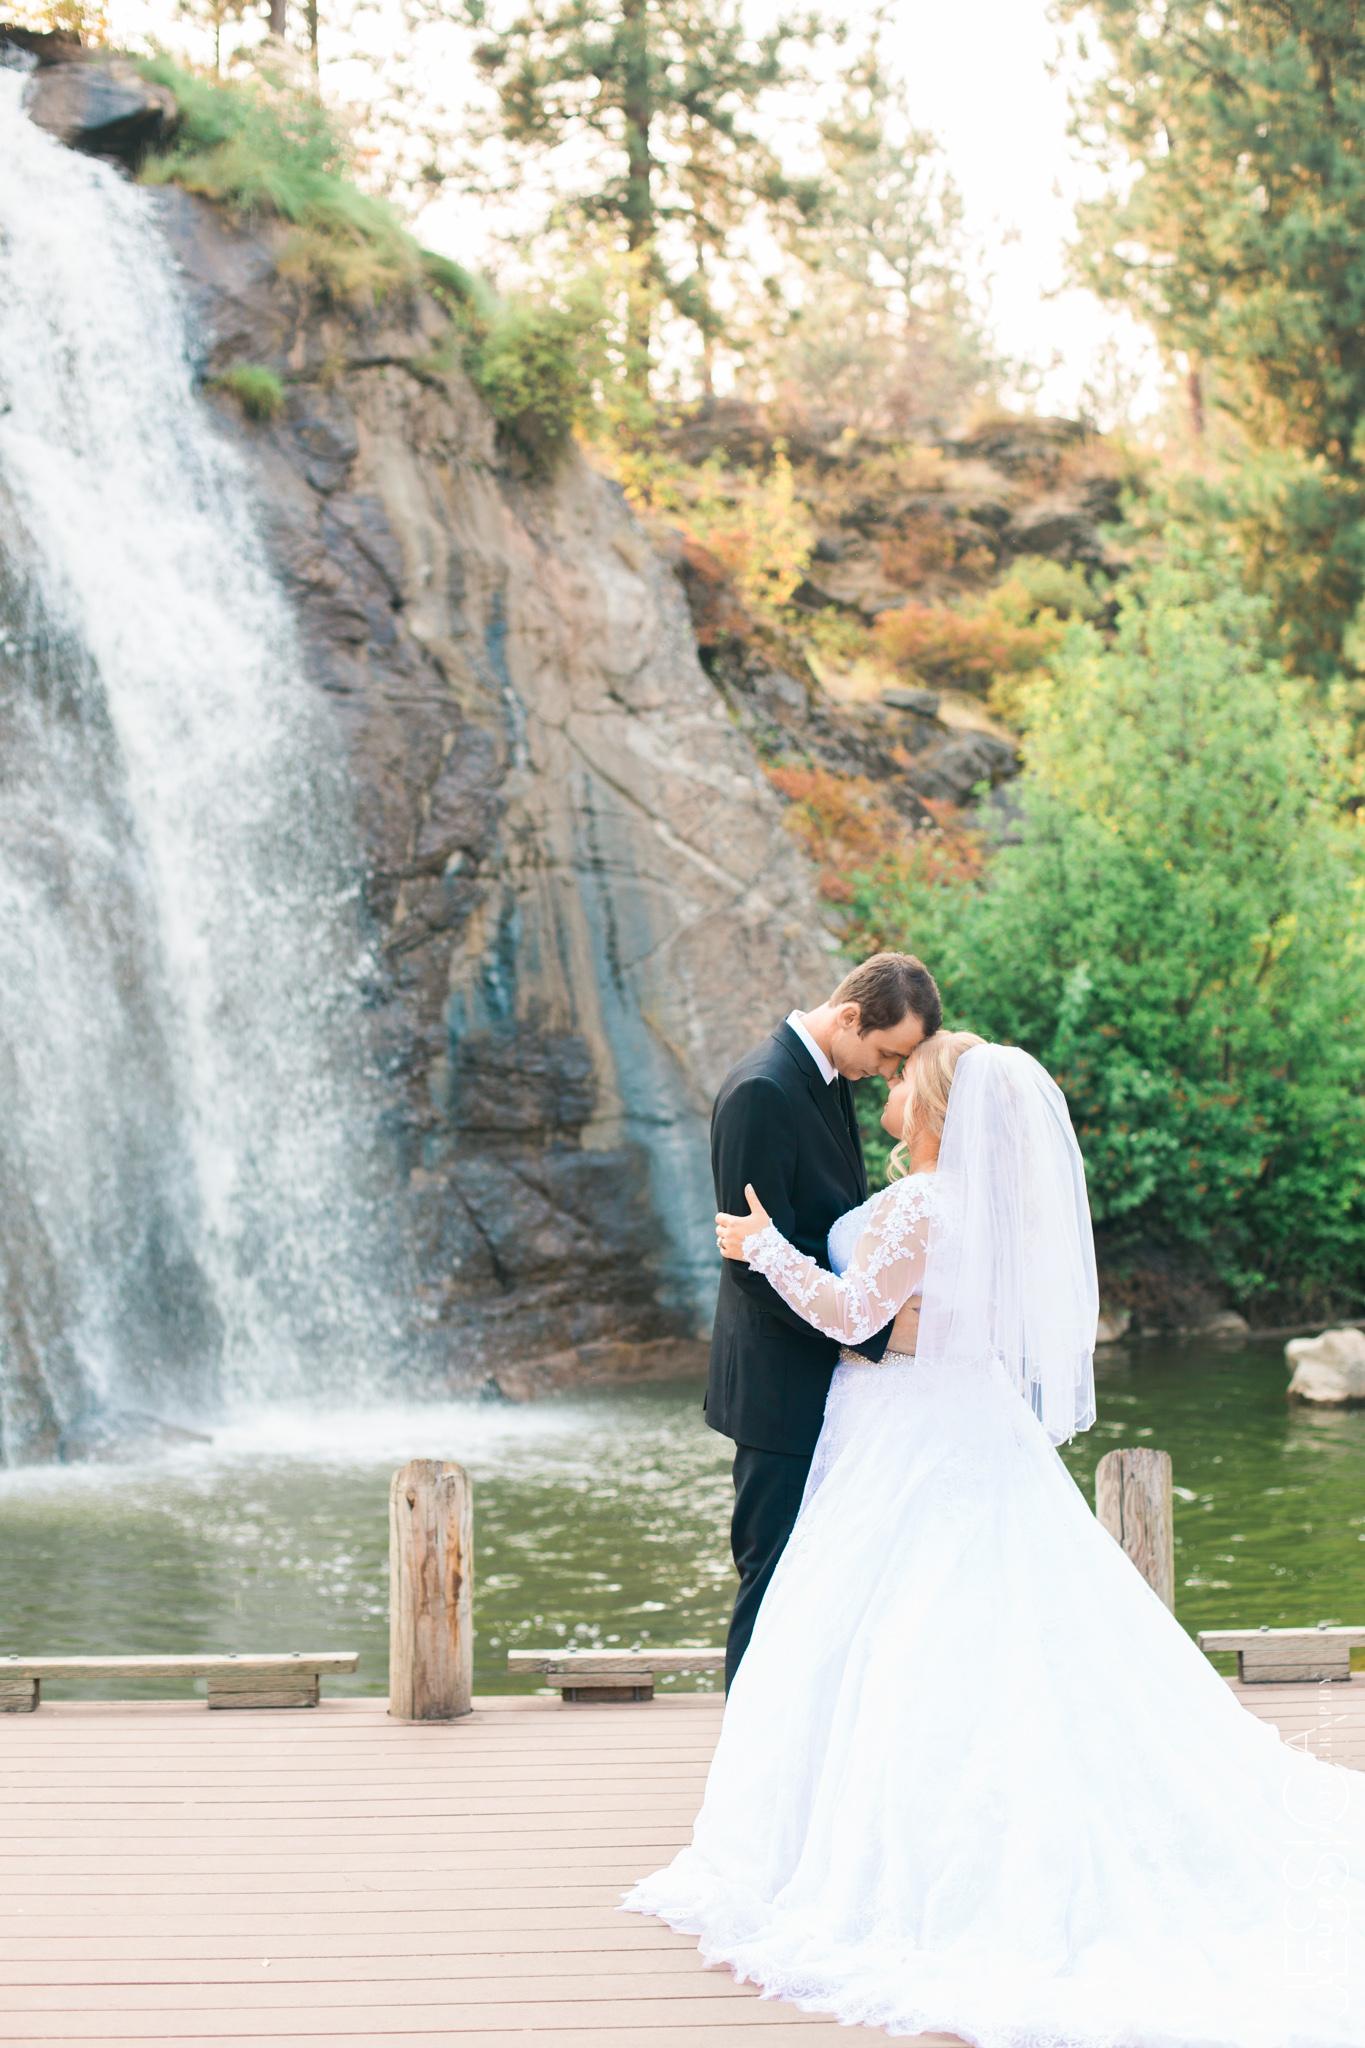 Eugene-Maryana_wedding_08062017_web (533 of 558).JPG